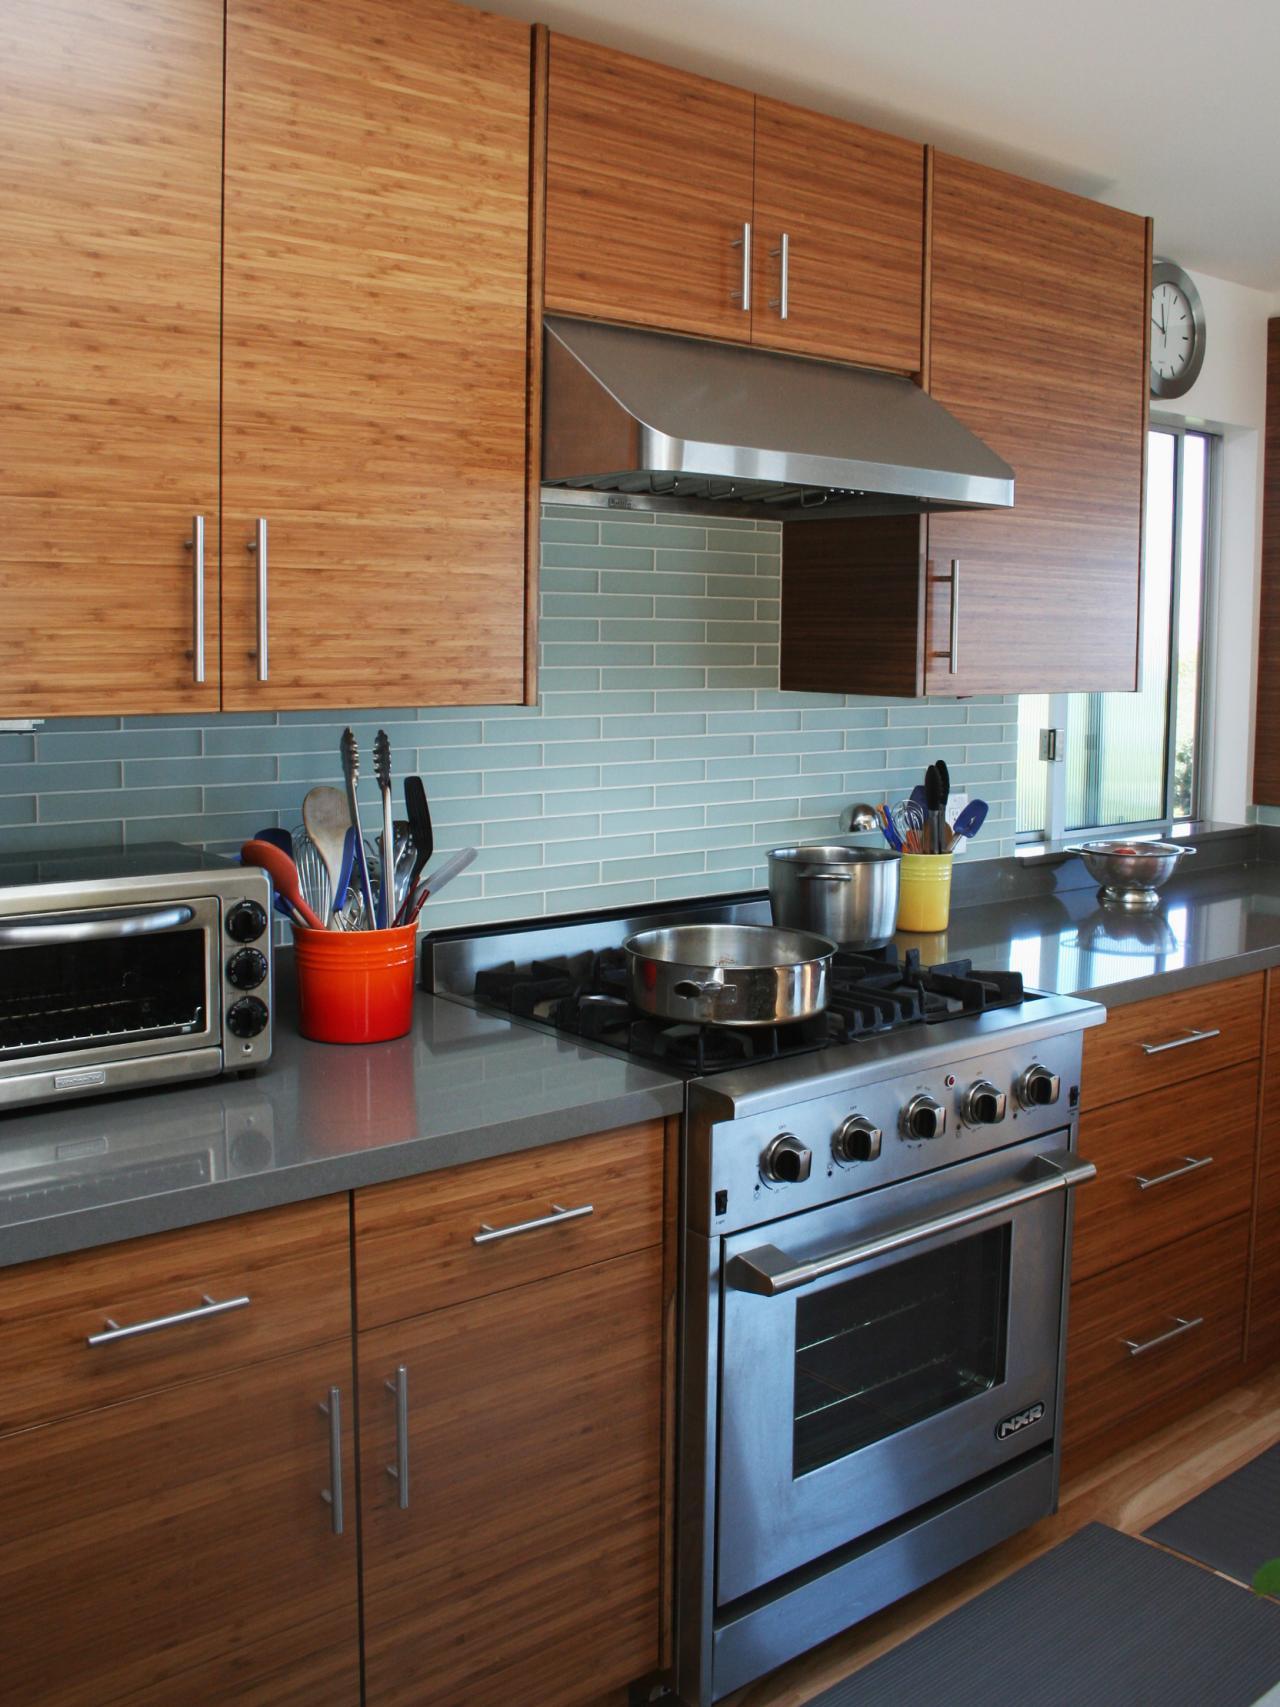 rs_custom-rum-moderne-køkken-stove_s3x4-jpg-rend-hgtvcom-1280-1707